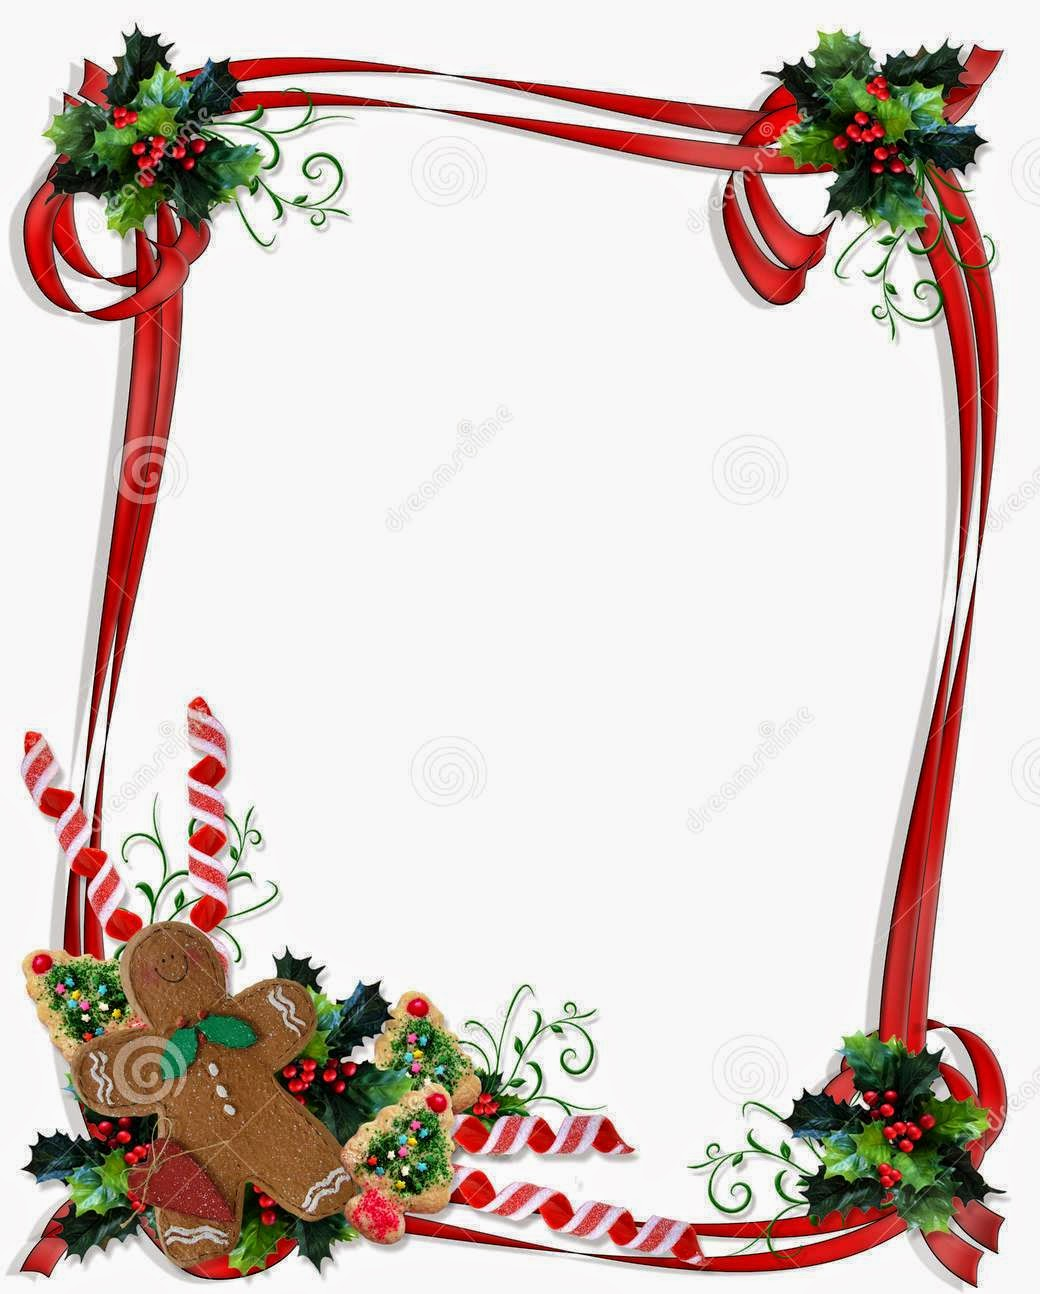 Free Christmas Border Frame Clipart.